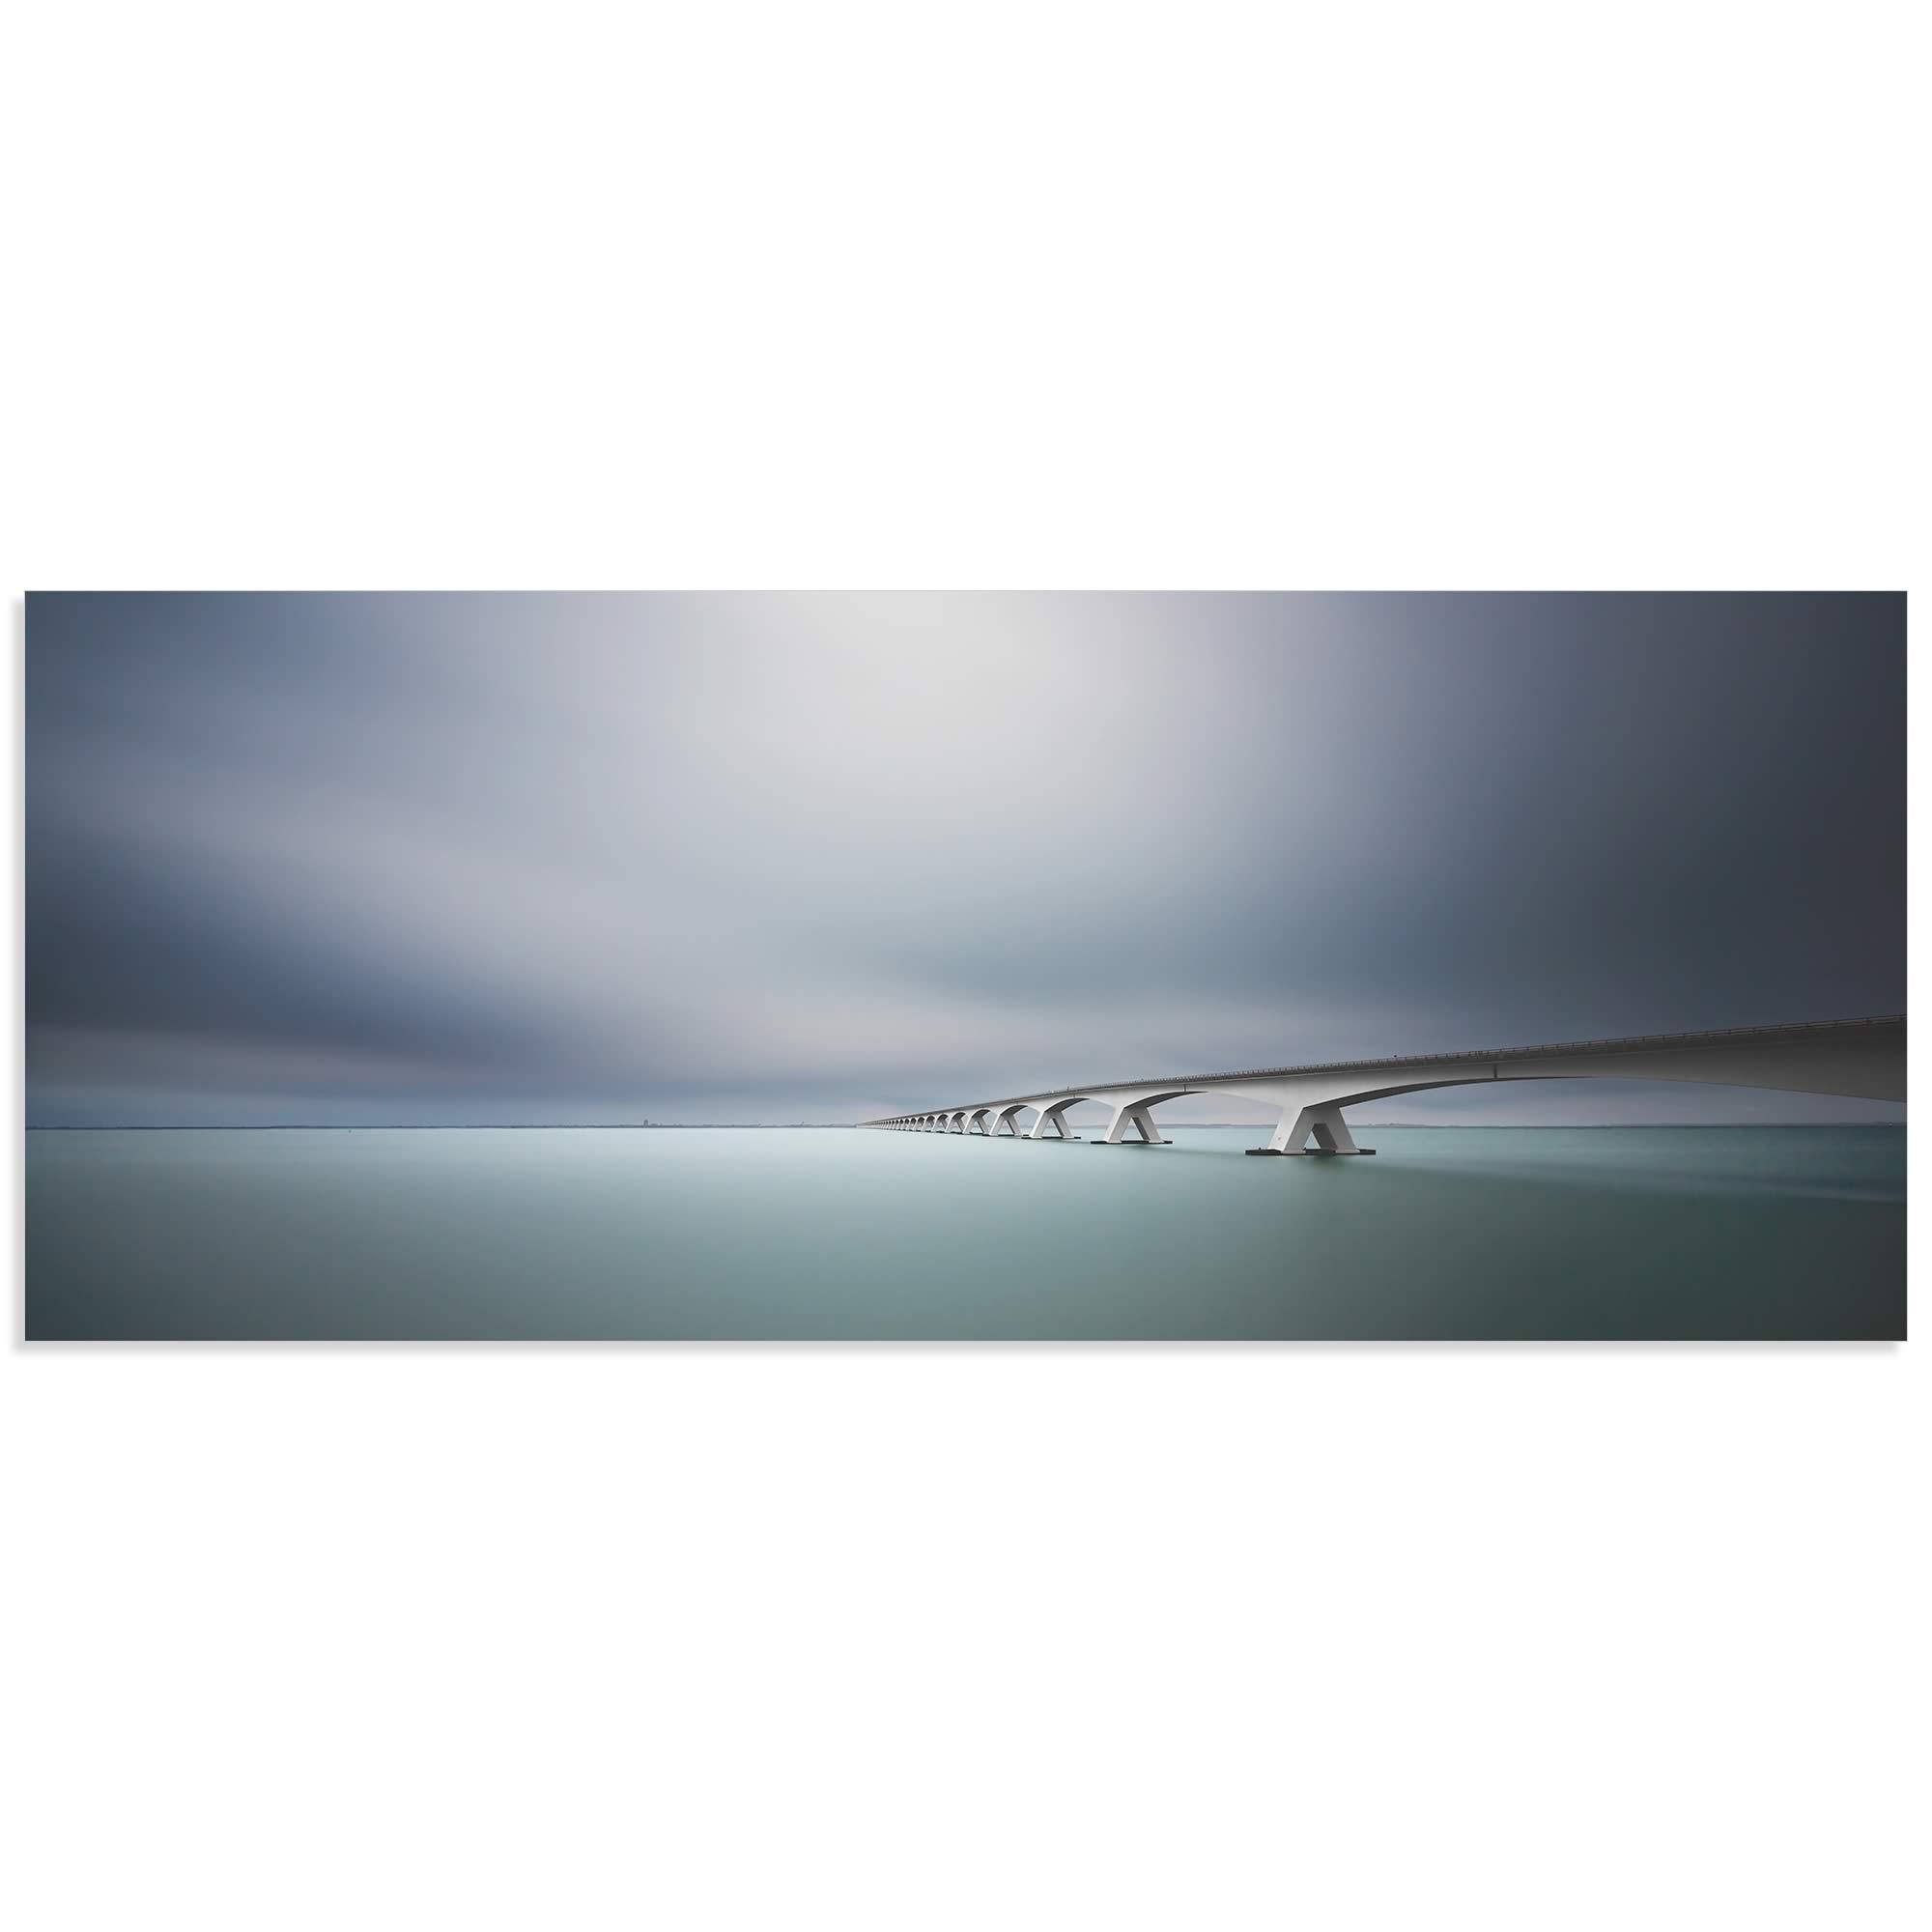 The Infinite Bridge by Arthur van Orden - Bridge Art on Metal or Acrylic